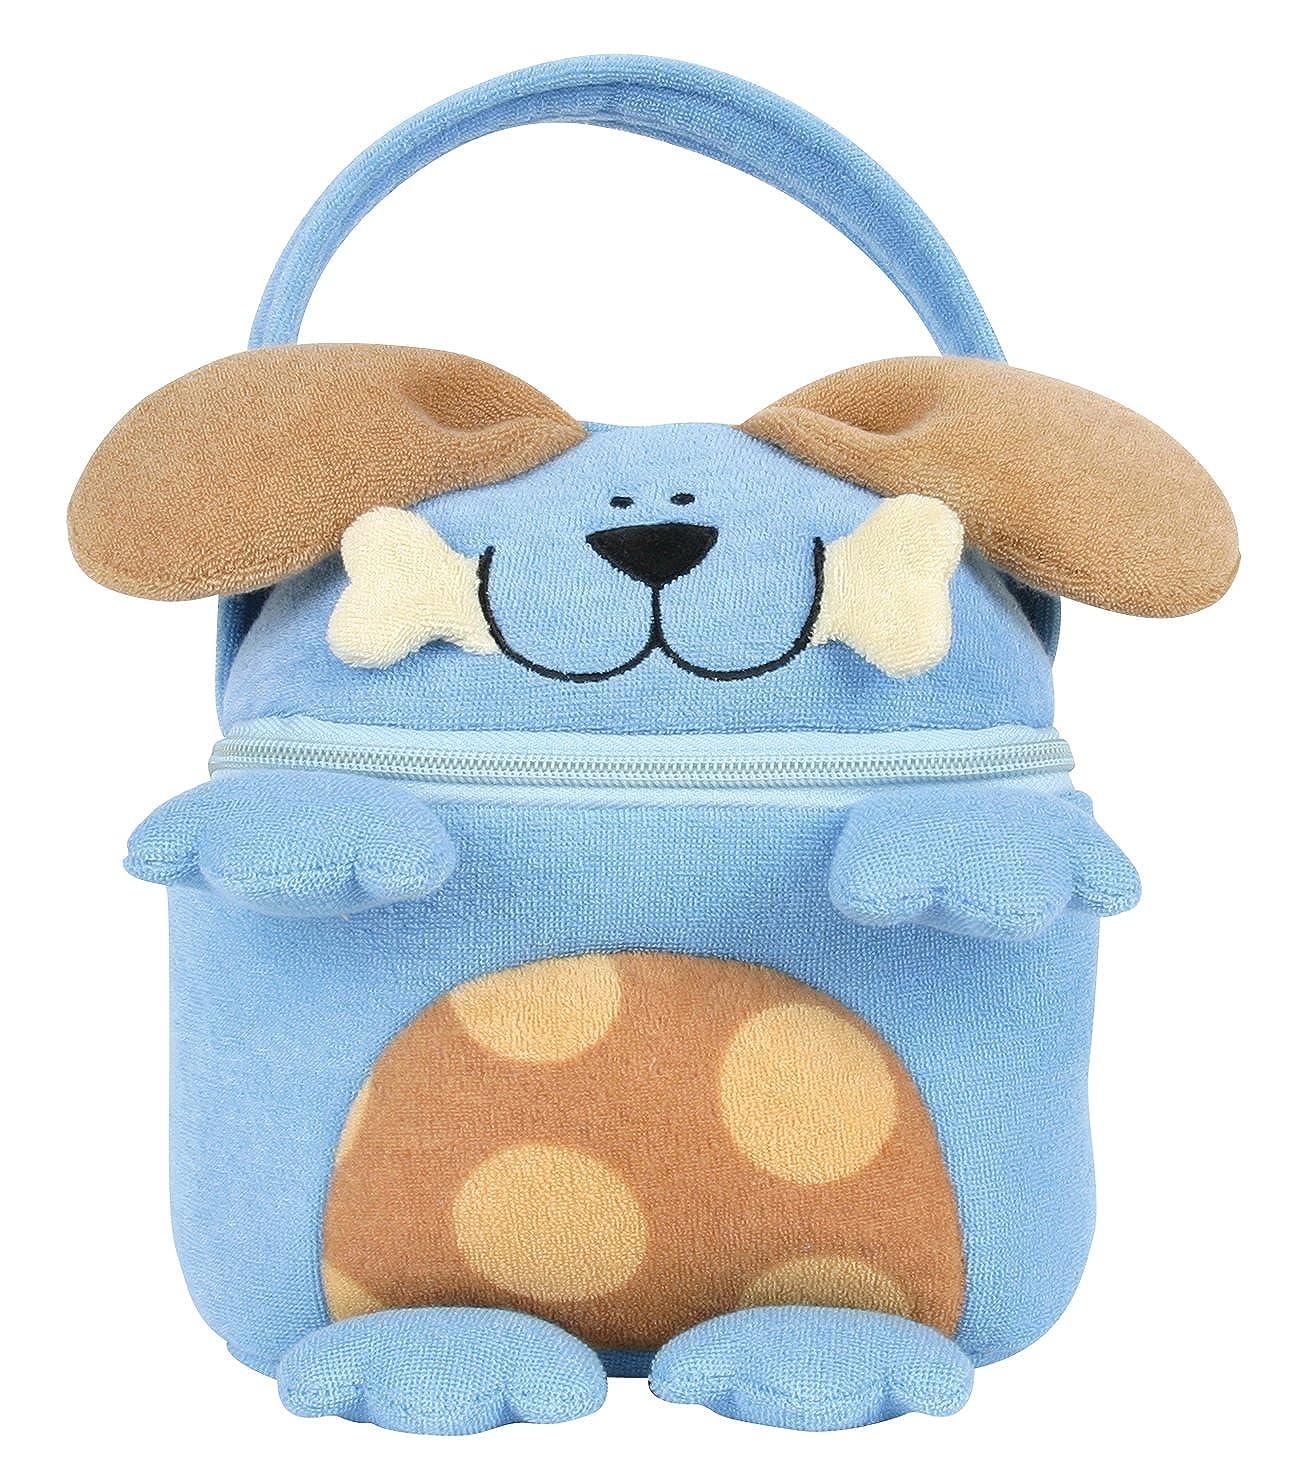 Bone Dog Buddy Bag 7.5 by Stephen Joseph